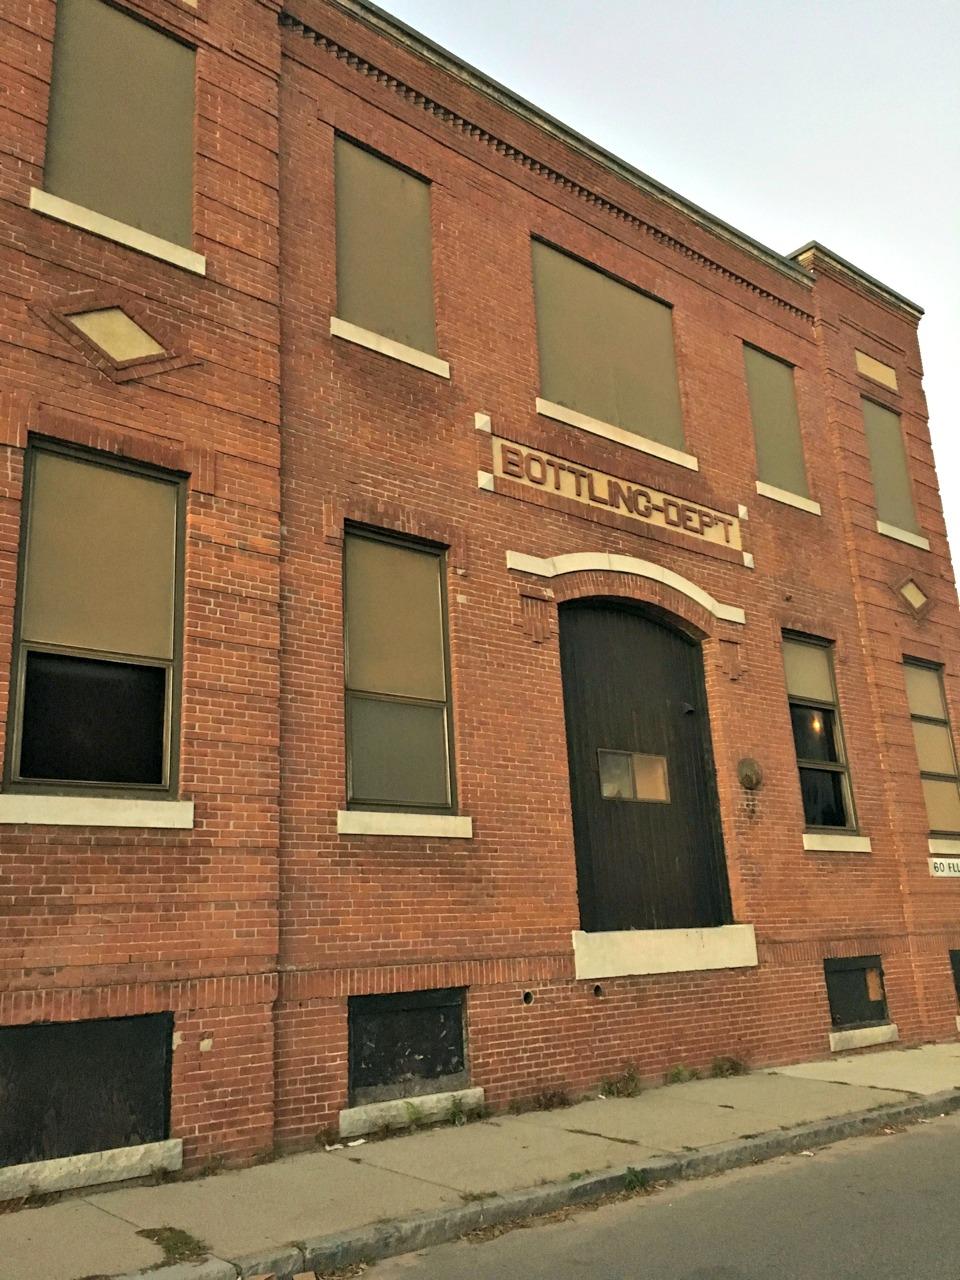 Brockert/Worcester Brewing Company building on Ellsworth Street.